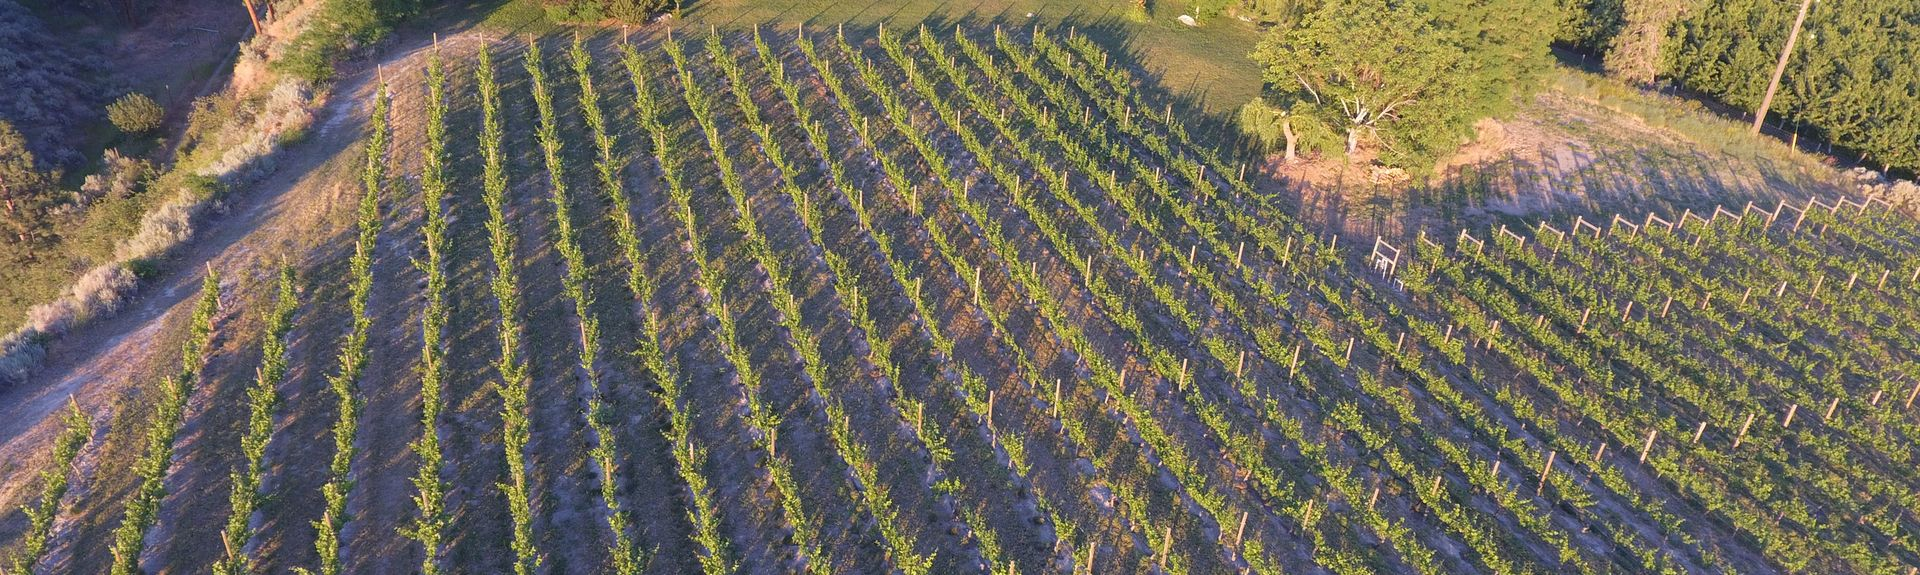 Therapy Vineyards, Naramata, British Columbia, Canada